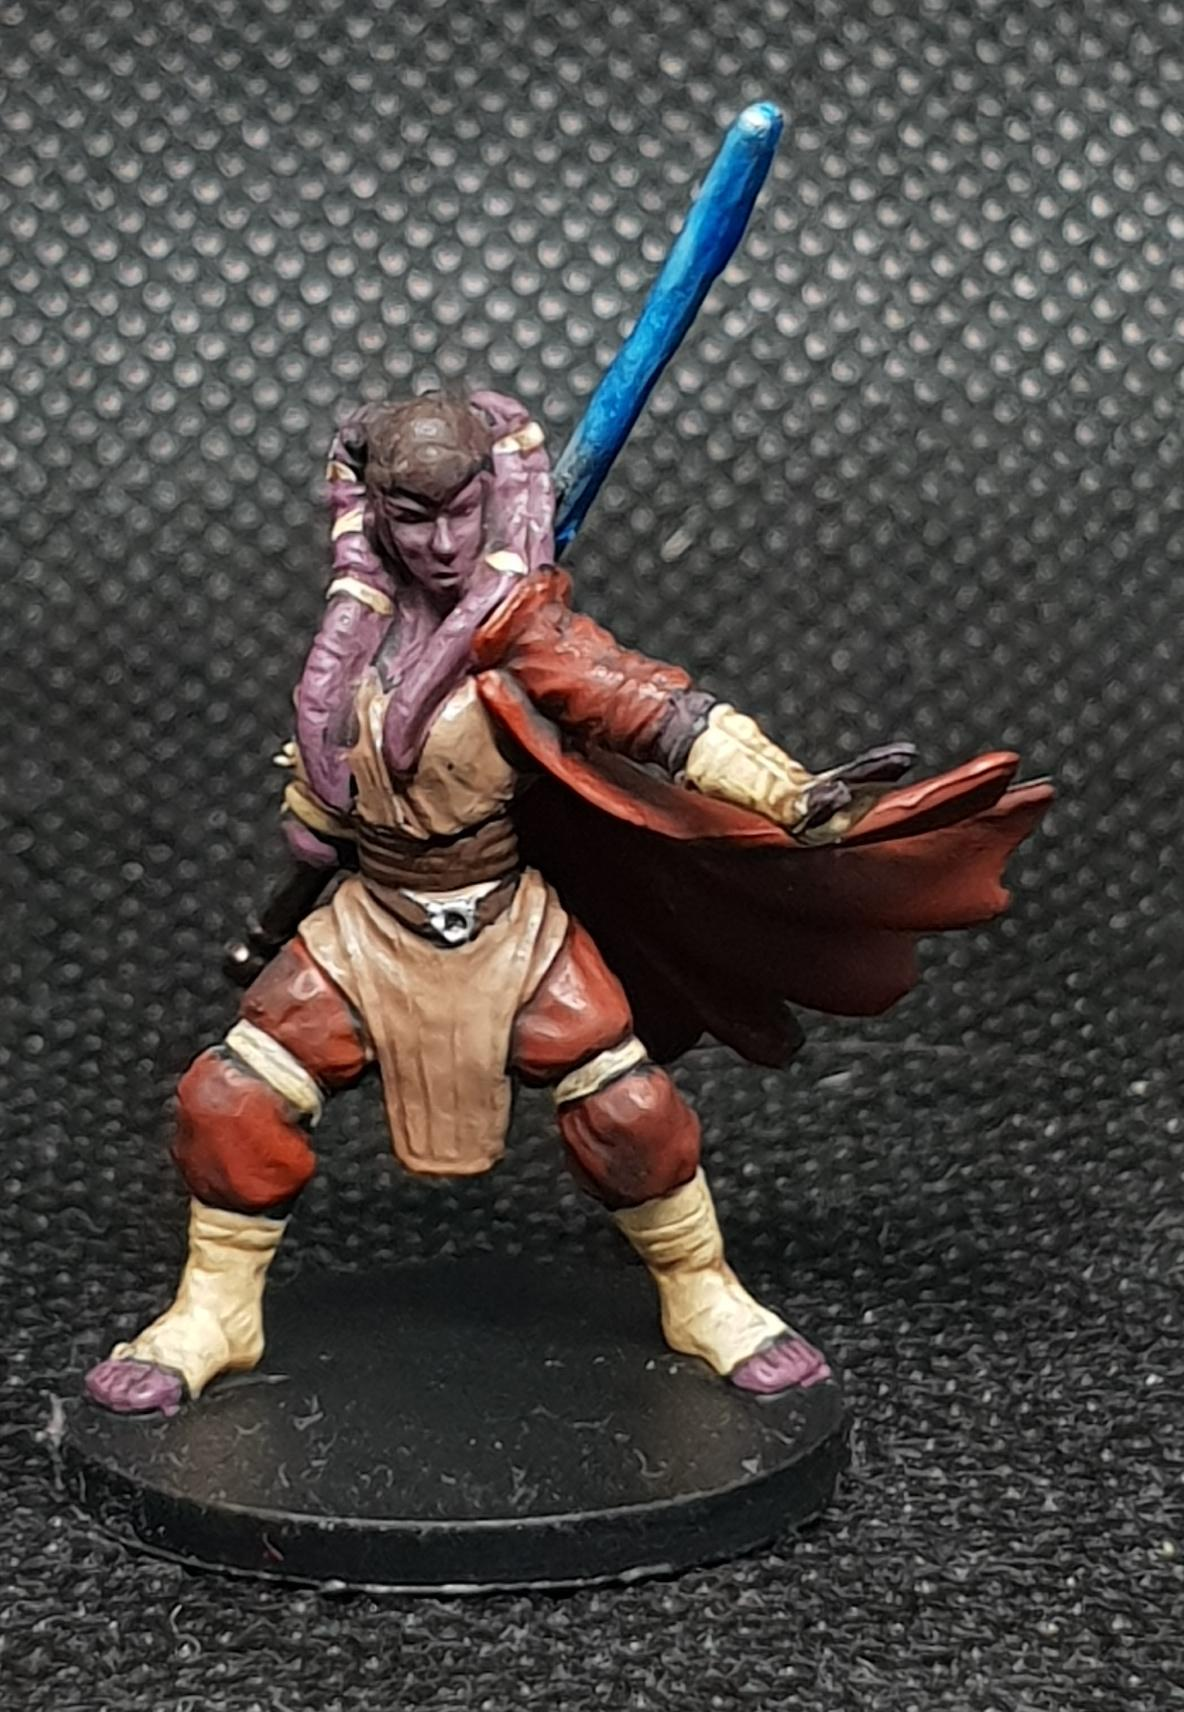 Imperial Assault, Jedi, Rebel, Star Wars